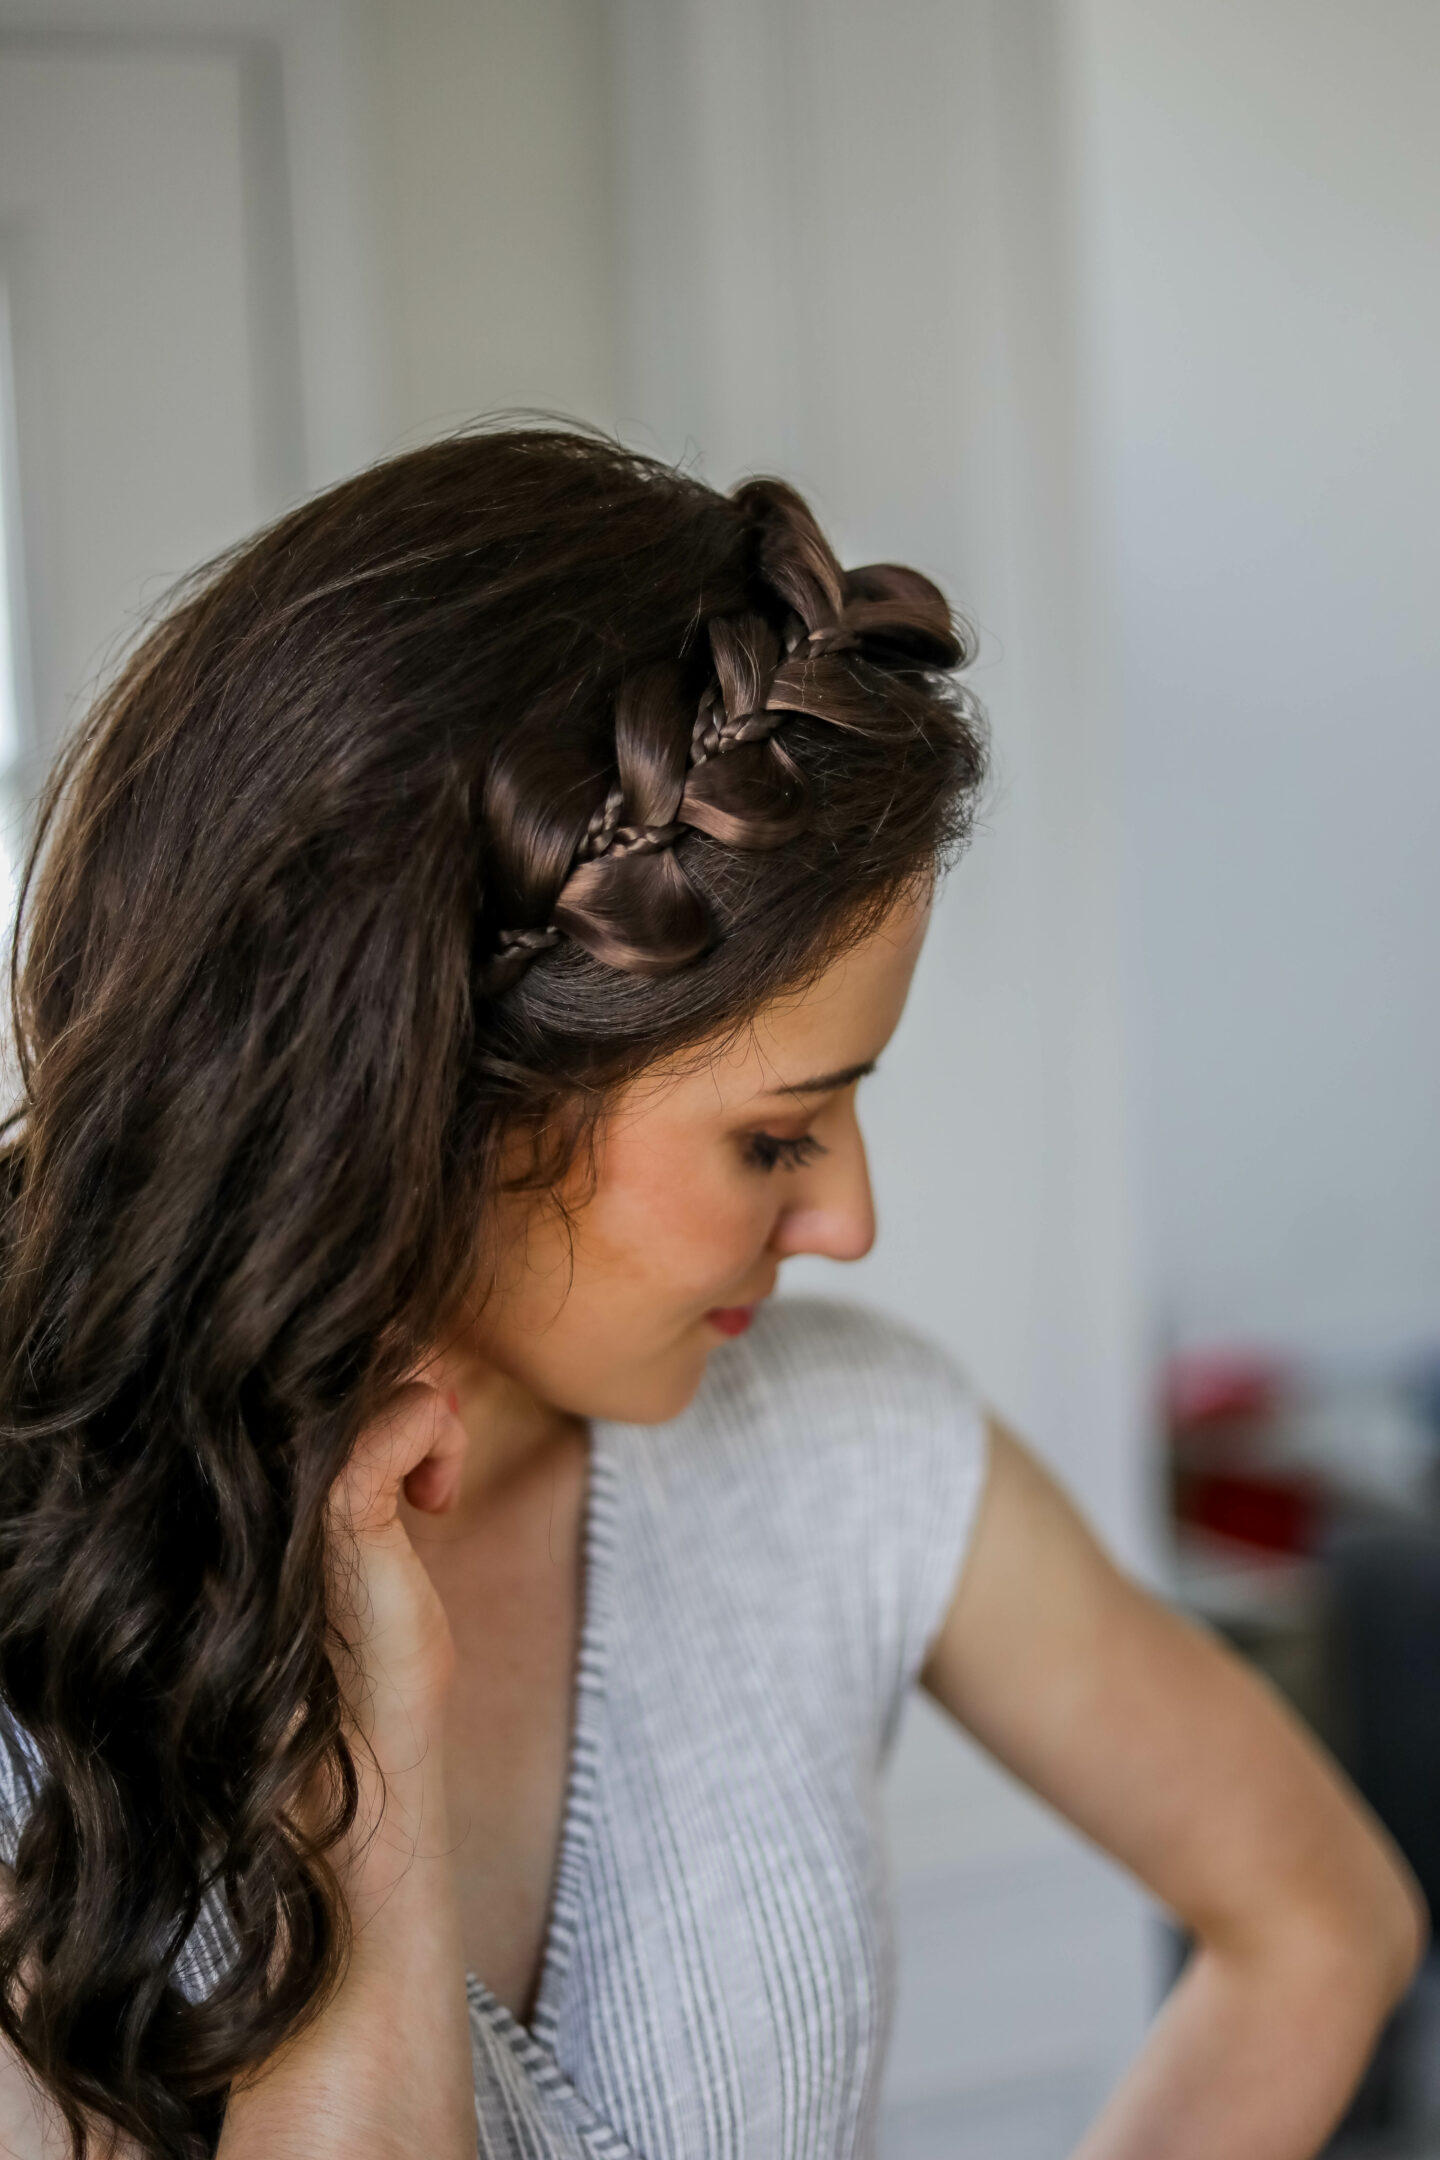 My 10 second EASY HAIR TRICK - an $18 fake braid headband!